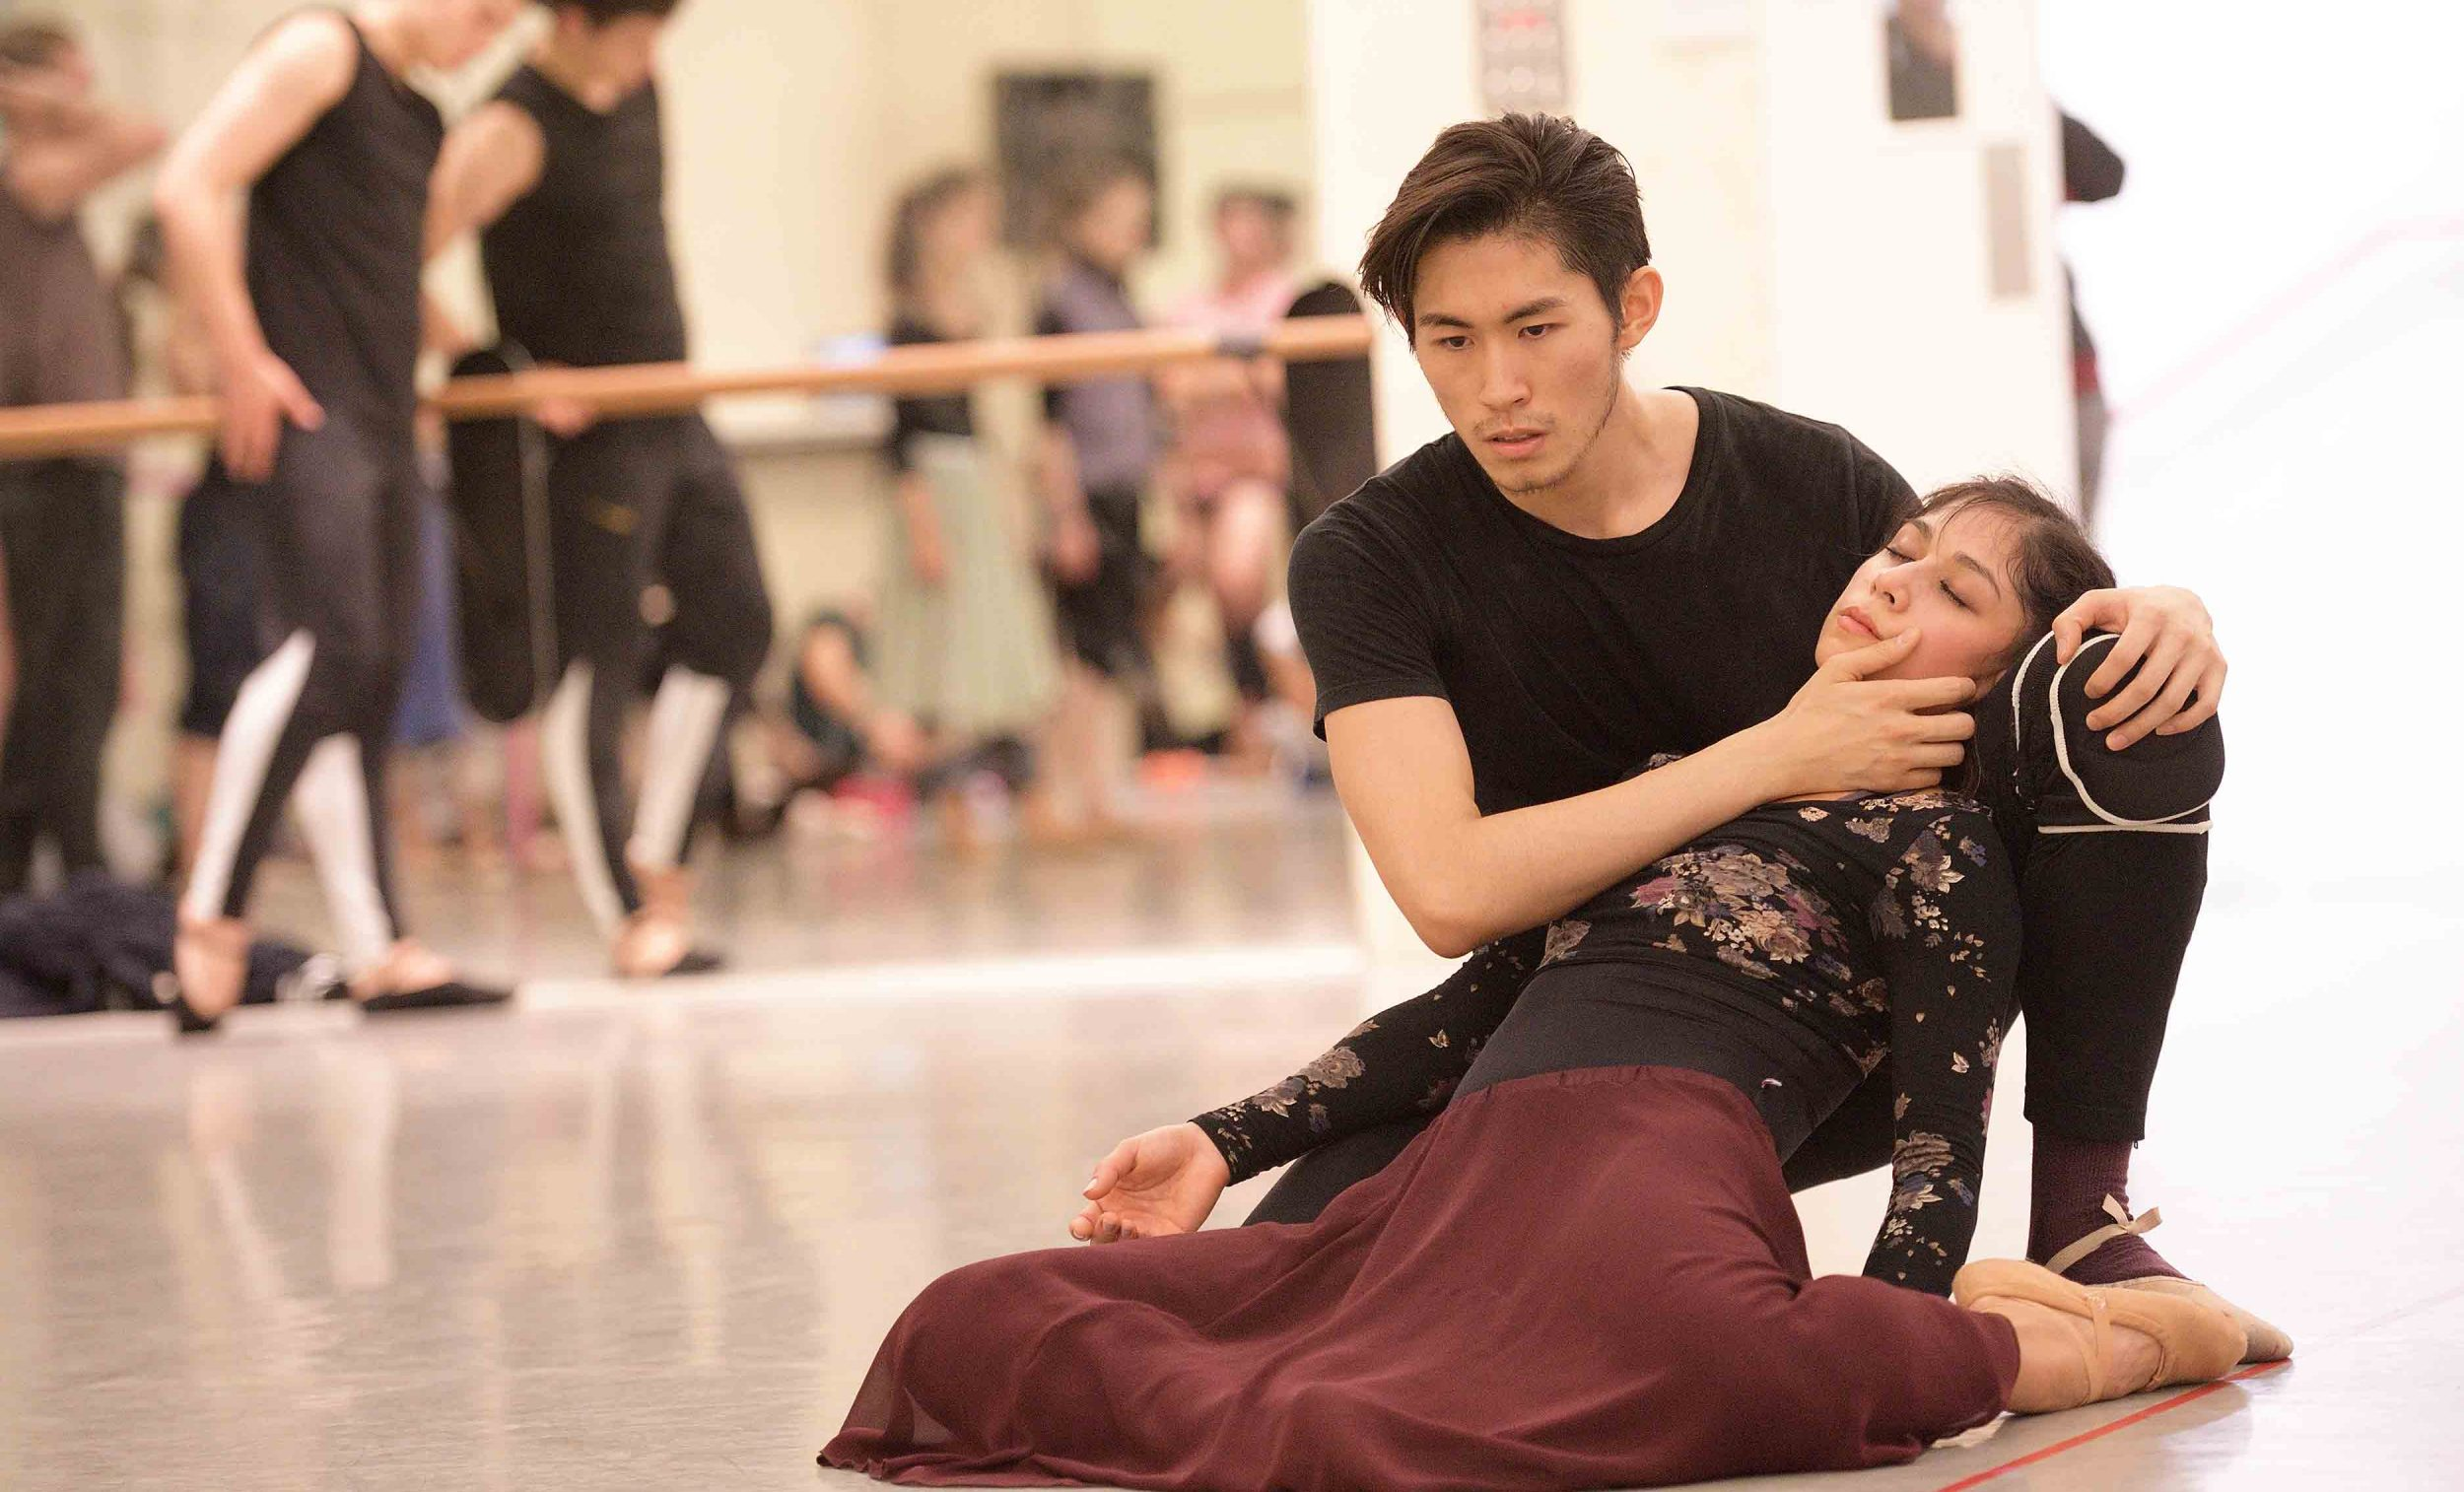 Crystal-Costa-and-Ken-Saruhashi-rehearsing-Akram-Khan's-Giselle-©-Laurent-Liotardo